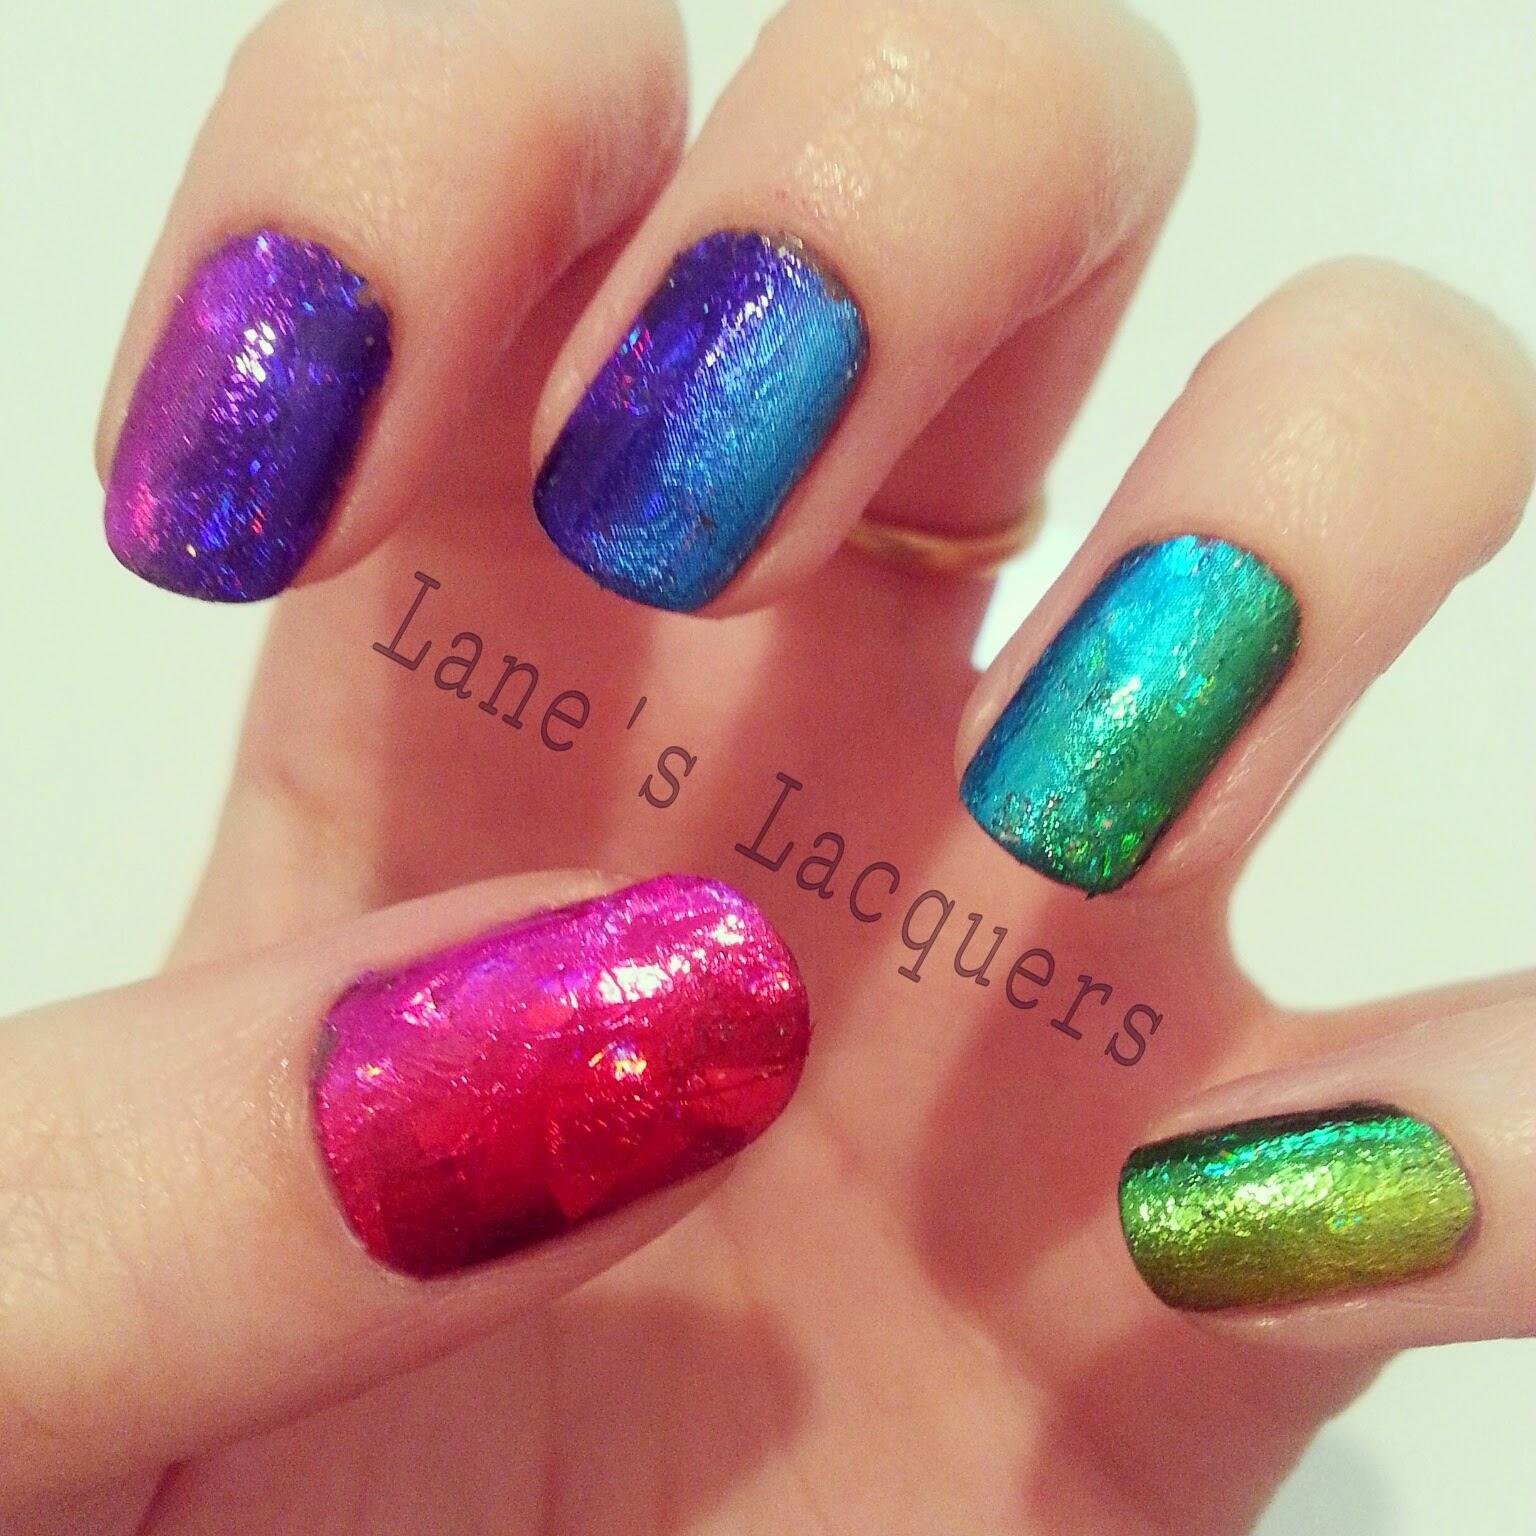 born-pretty-store-rainbow-nail-foil-nail-art-manicure (2)